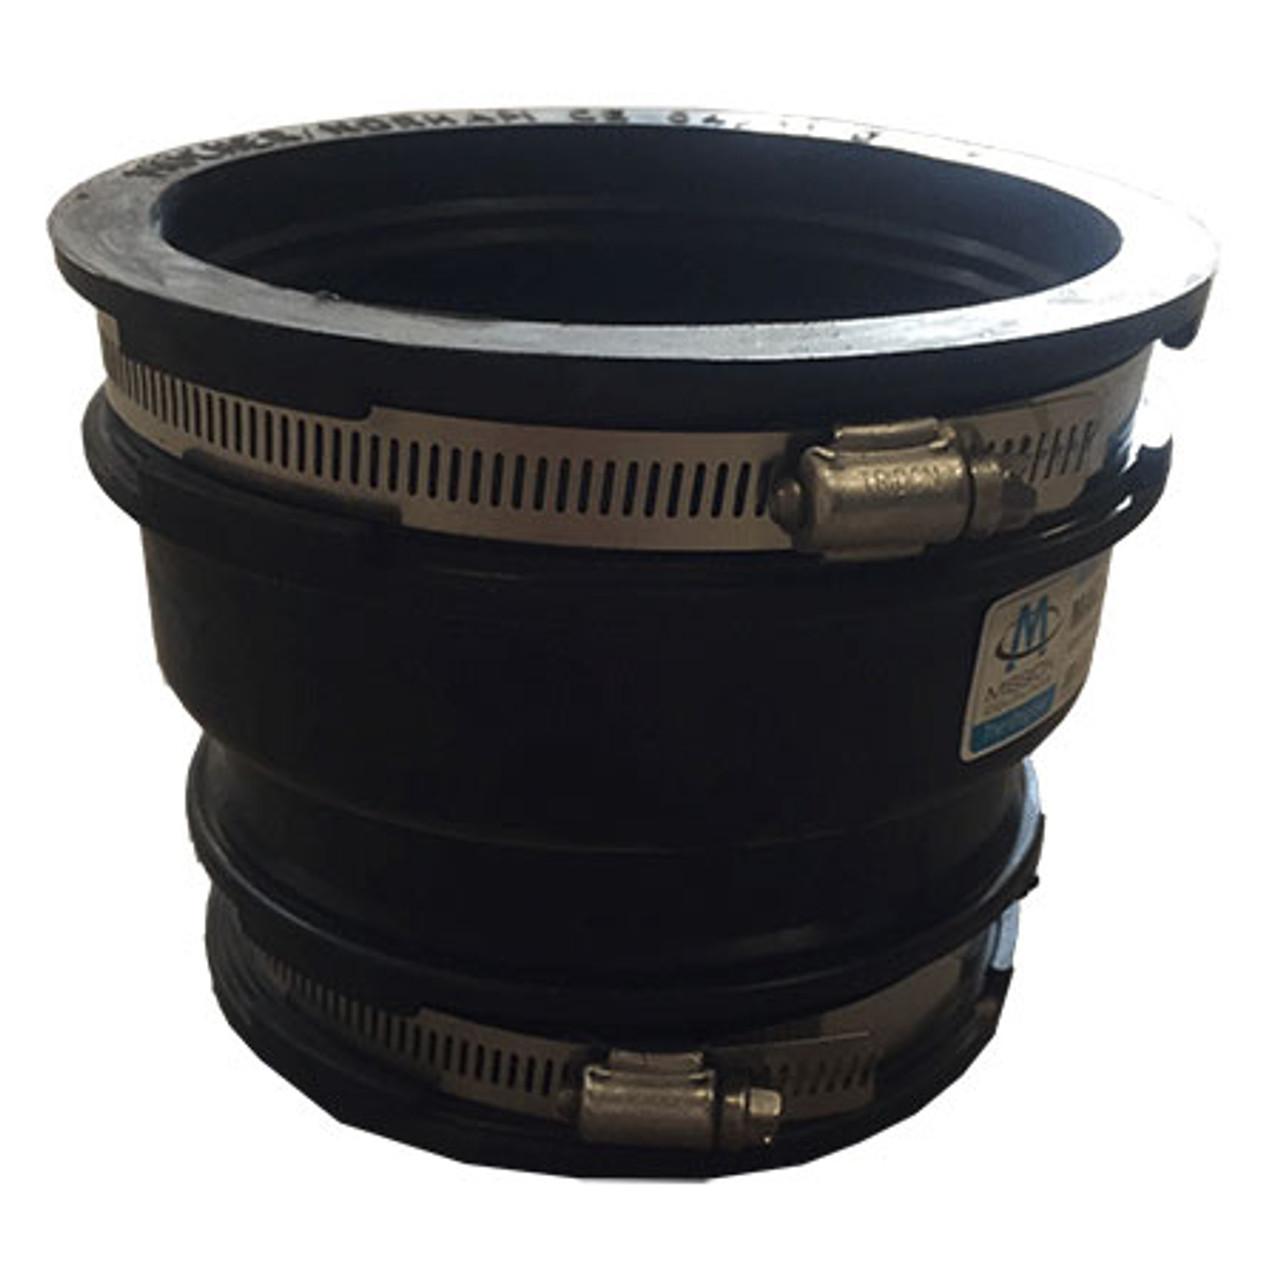 110-125/100-115 Drainage Adaptor